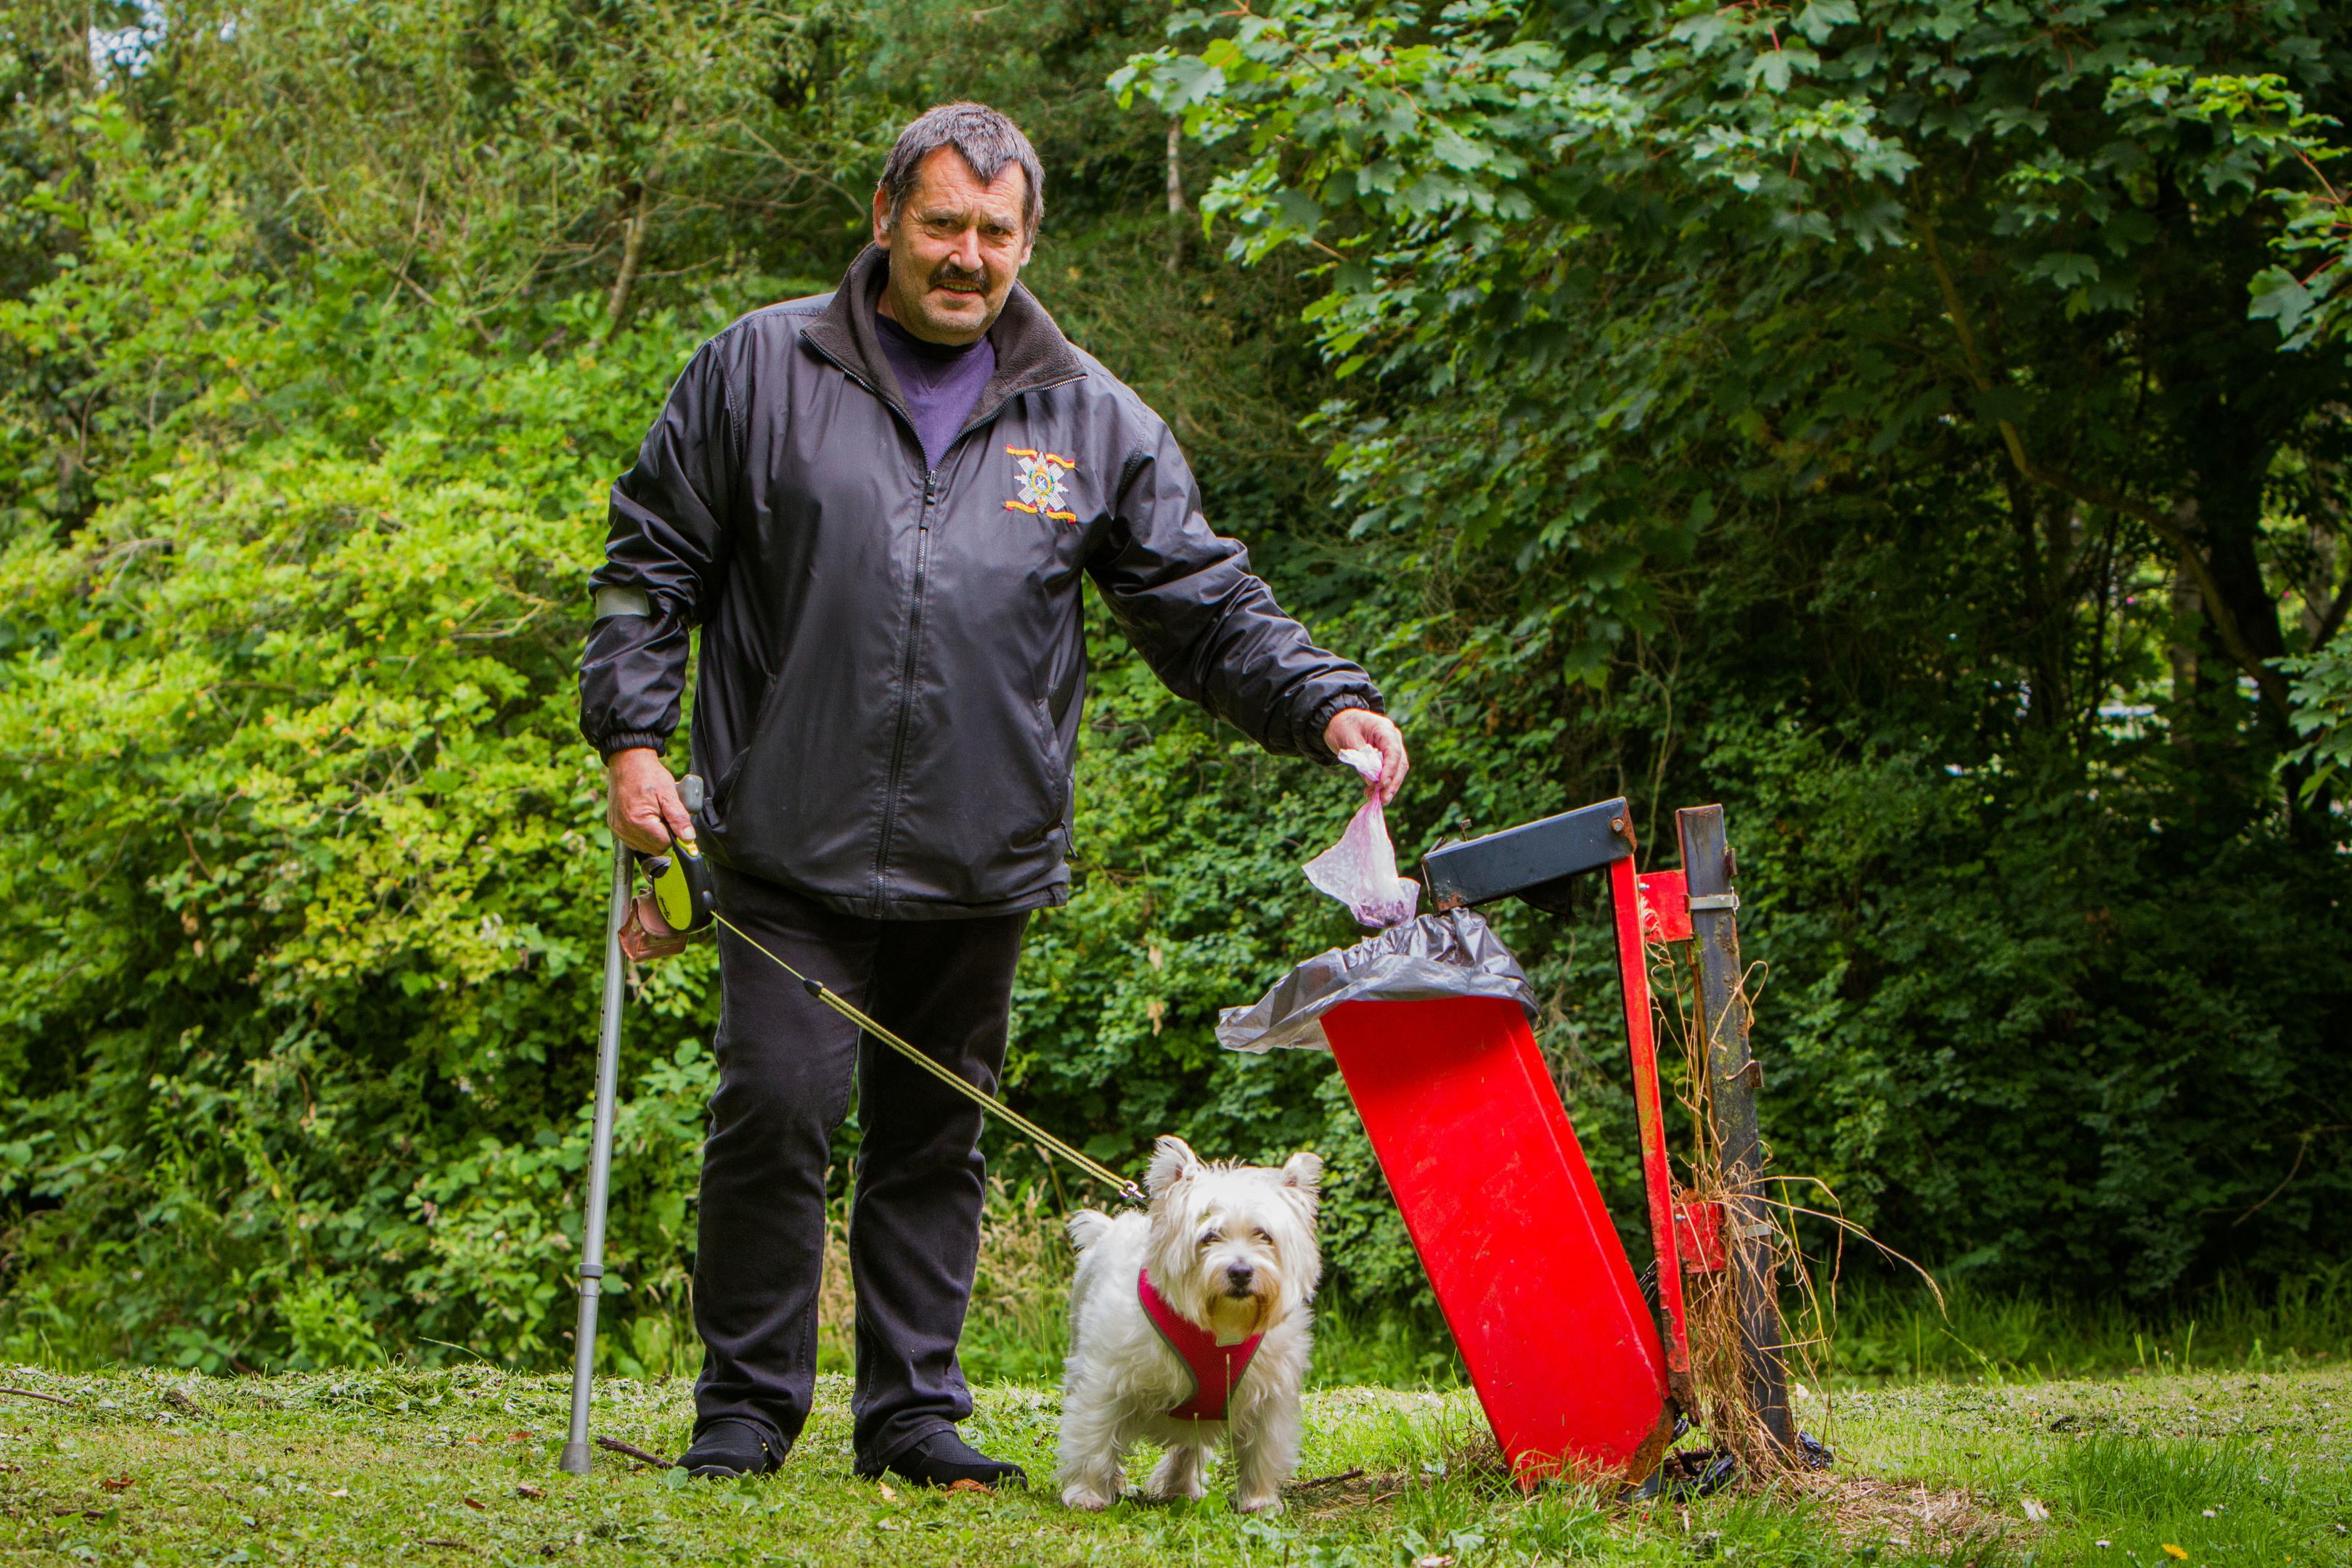 Peter Scobie and dog 'Misha'.